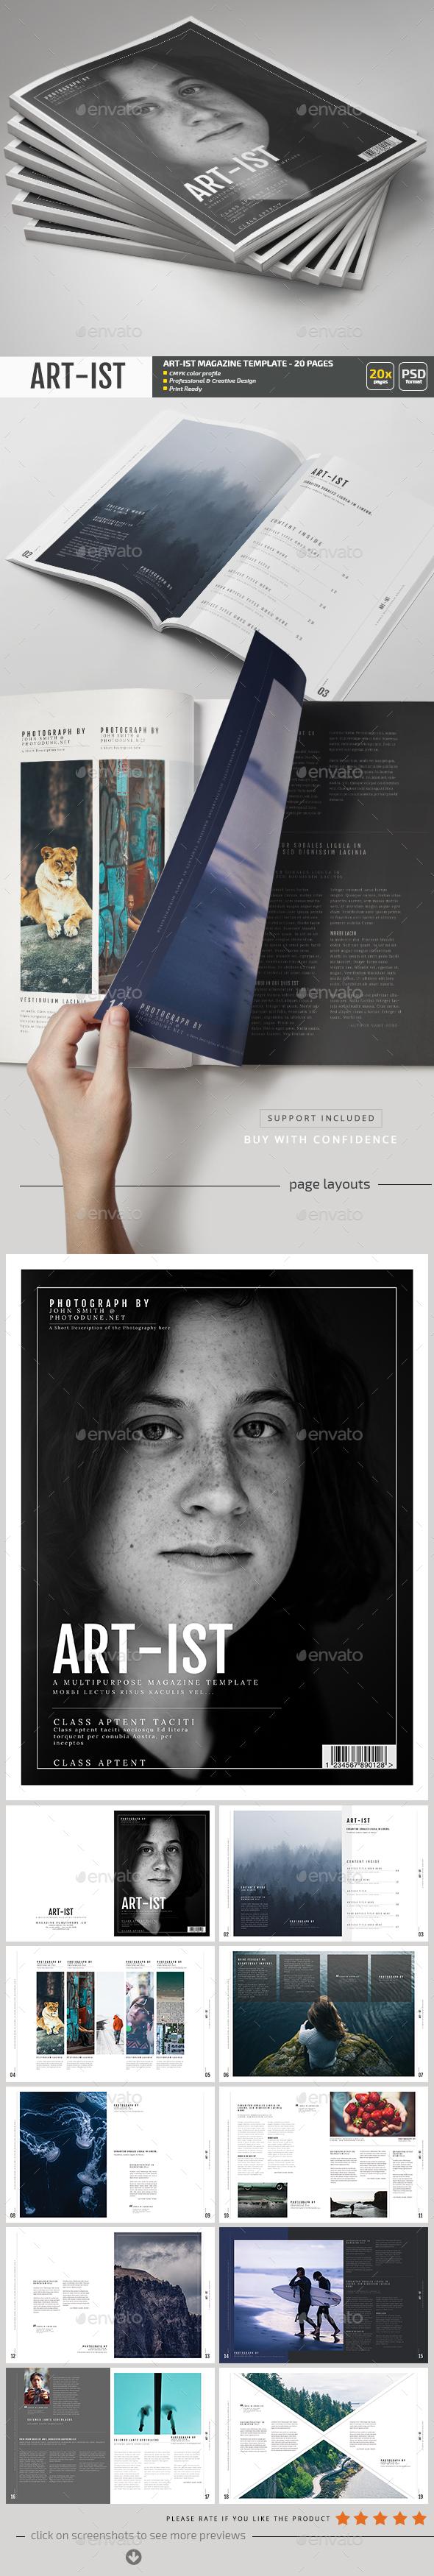 Art-ist Magazine Template V.19 - Magazines Print Templates